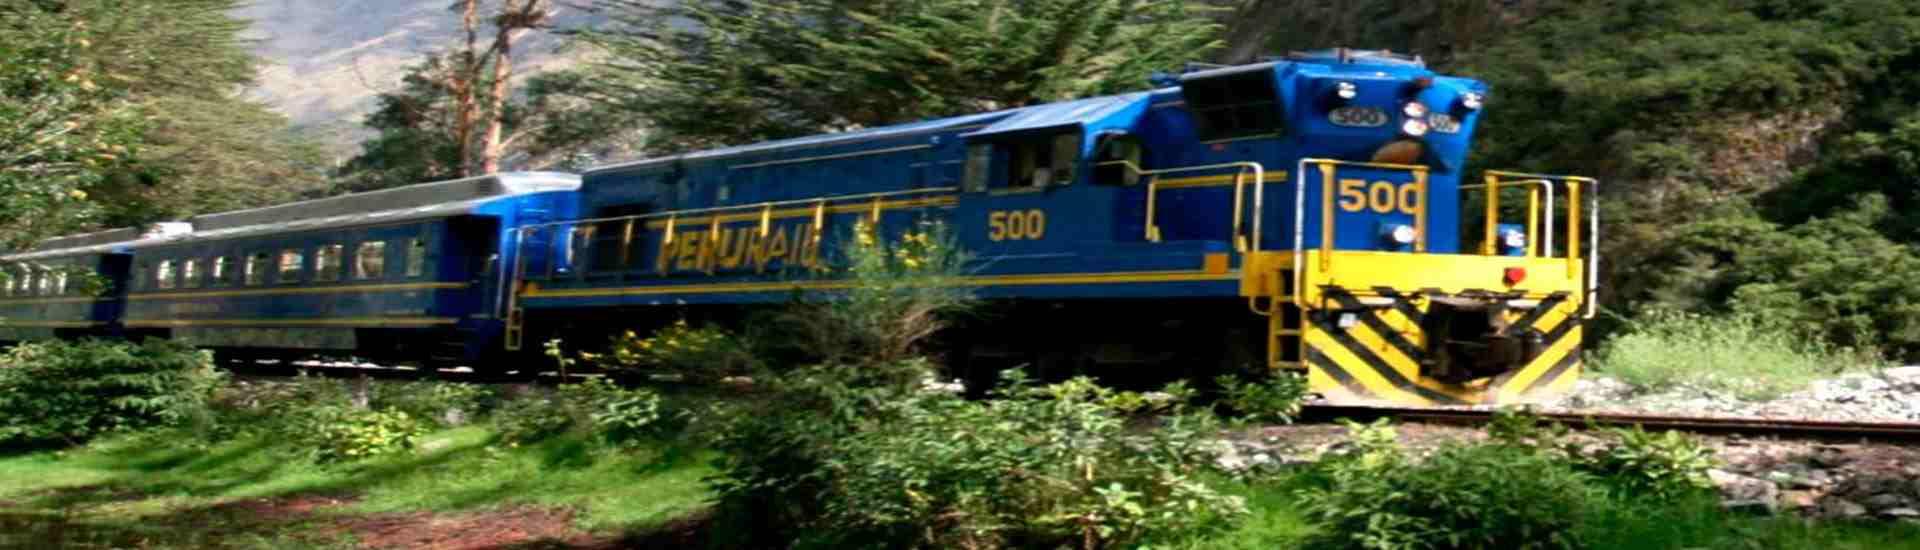 viajes en tren toursperumachupicchu